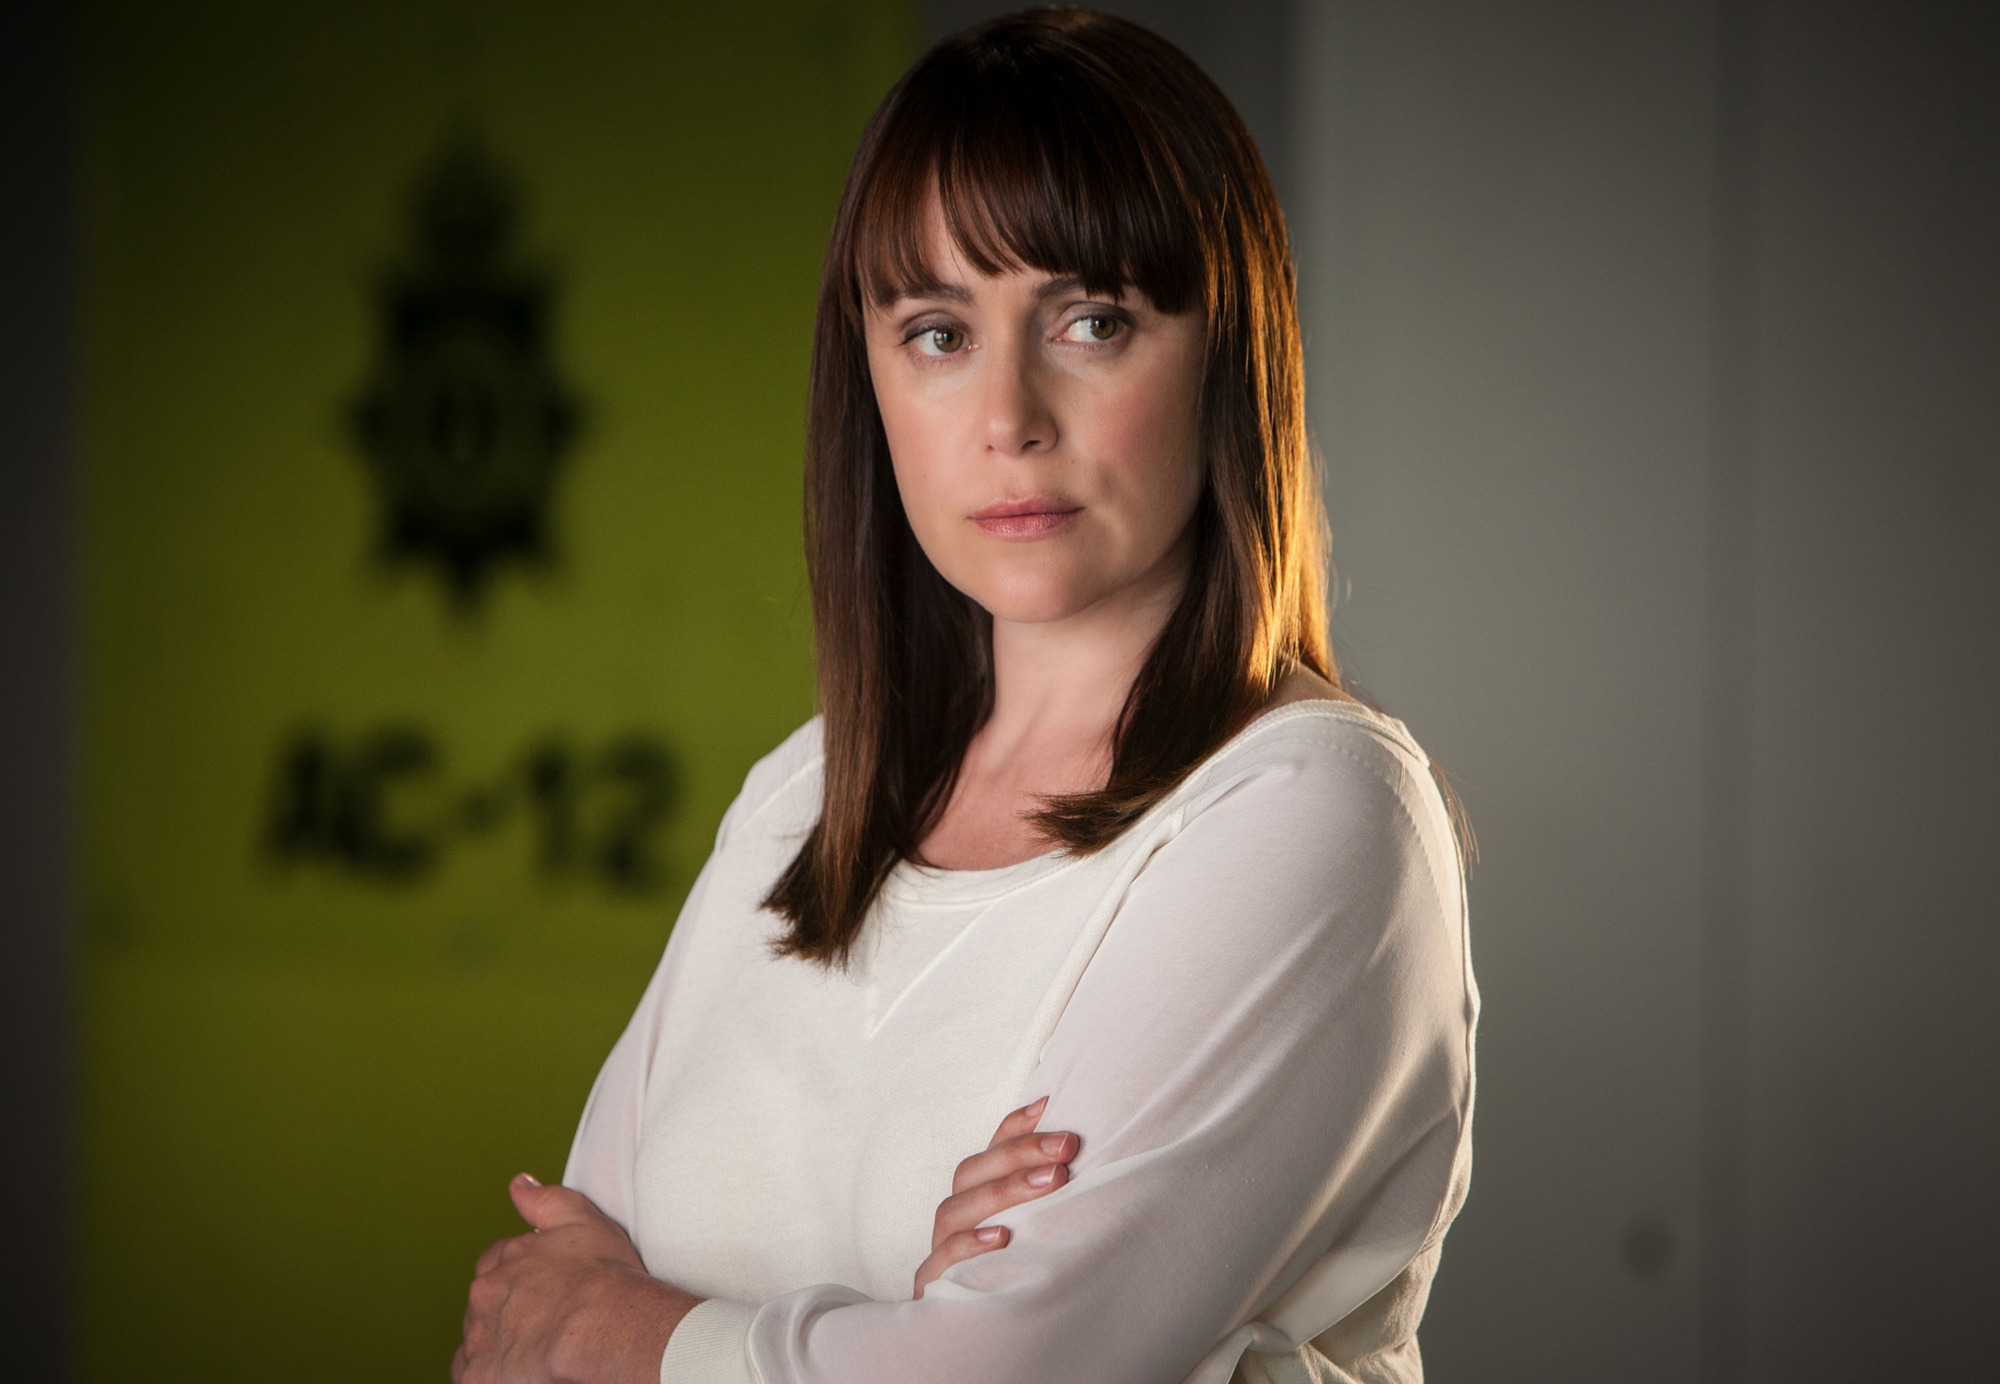 Line of Duty: Can Lindsay Denton really be as innocent as she seems?